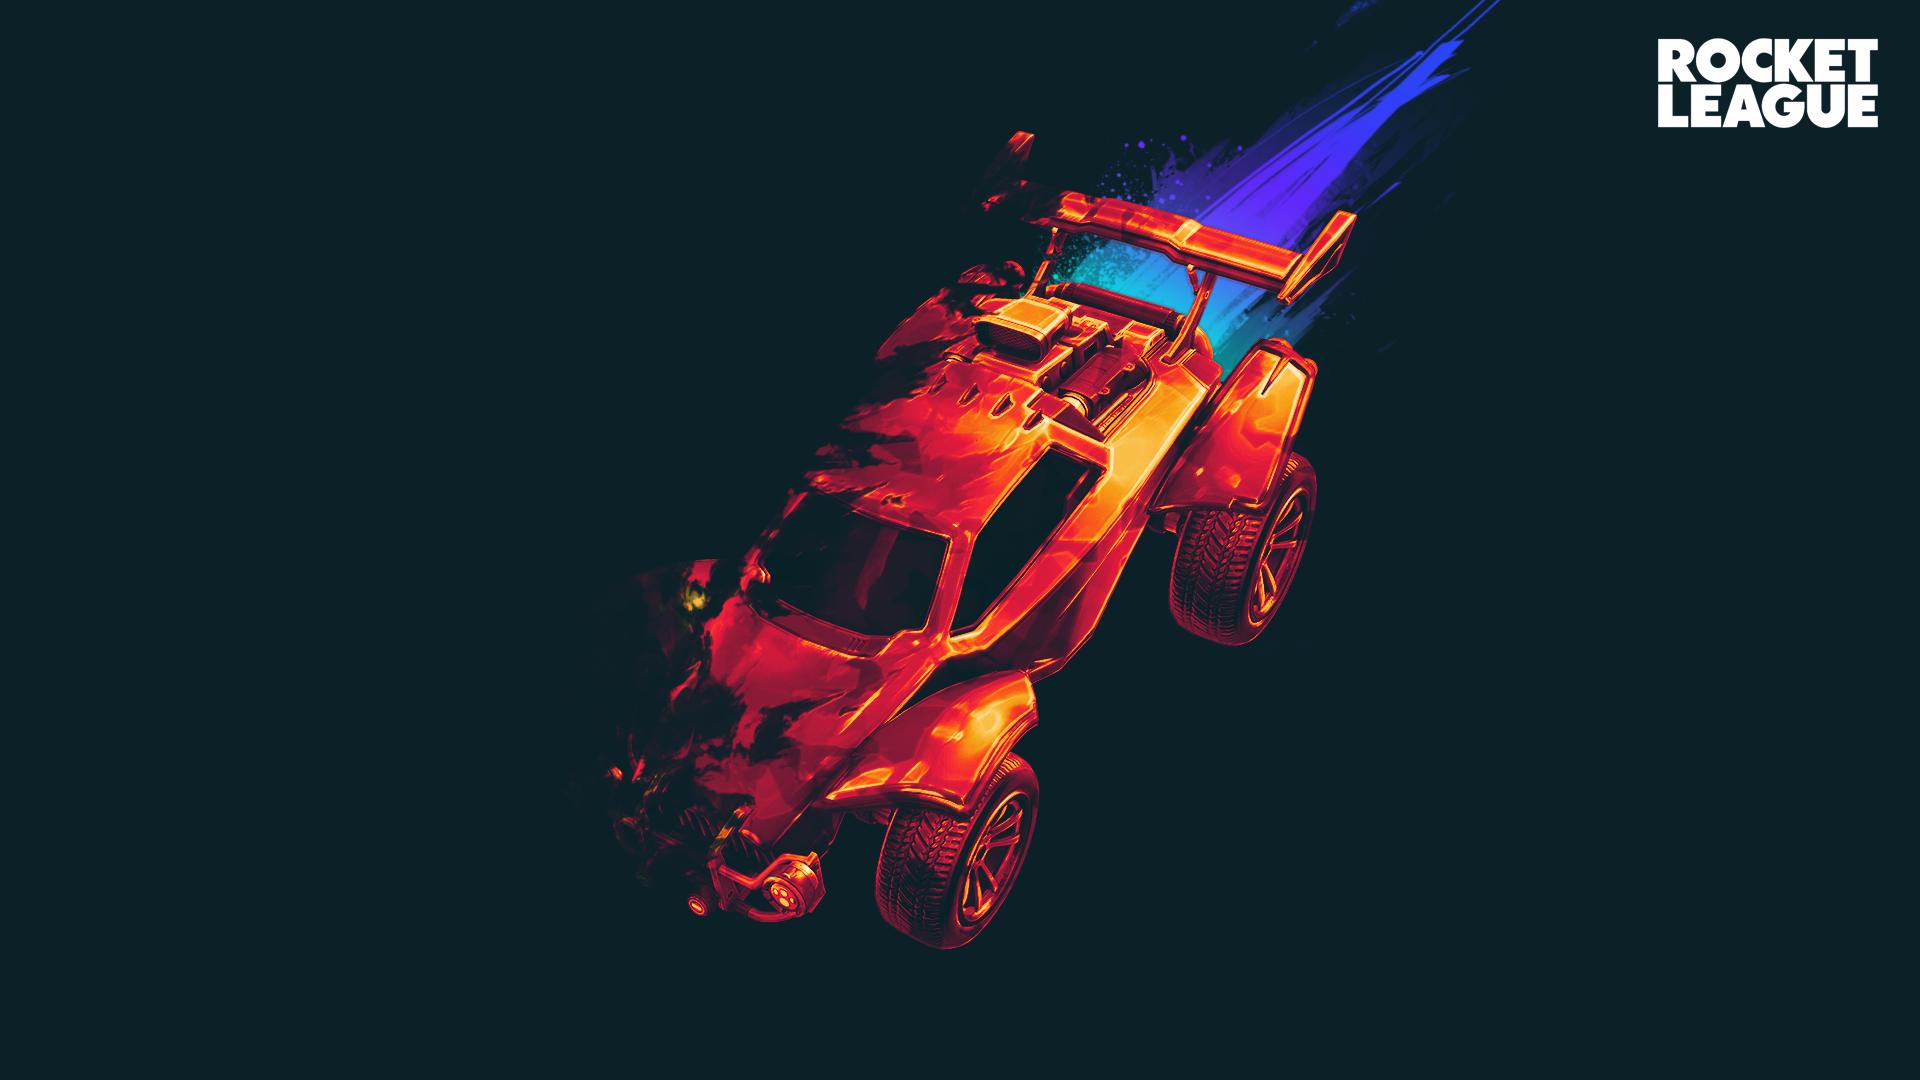 Rocket League Octane Wallpapers - Wallpaper Cave